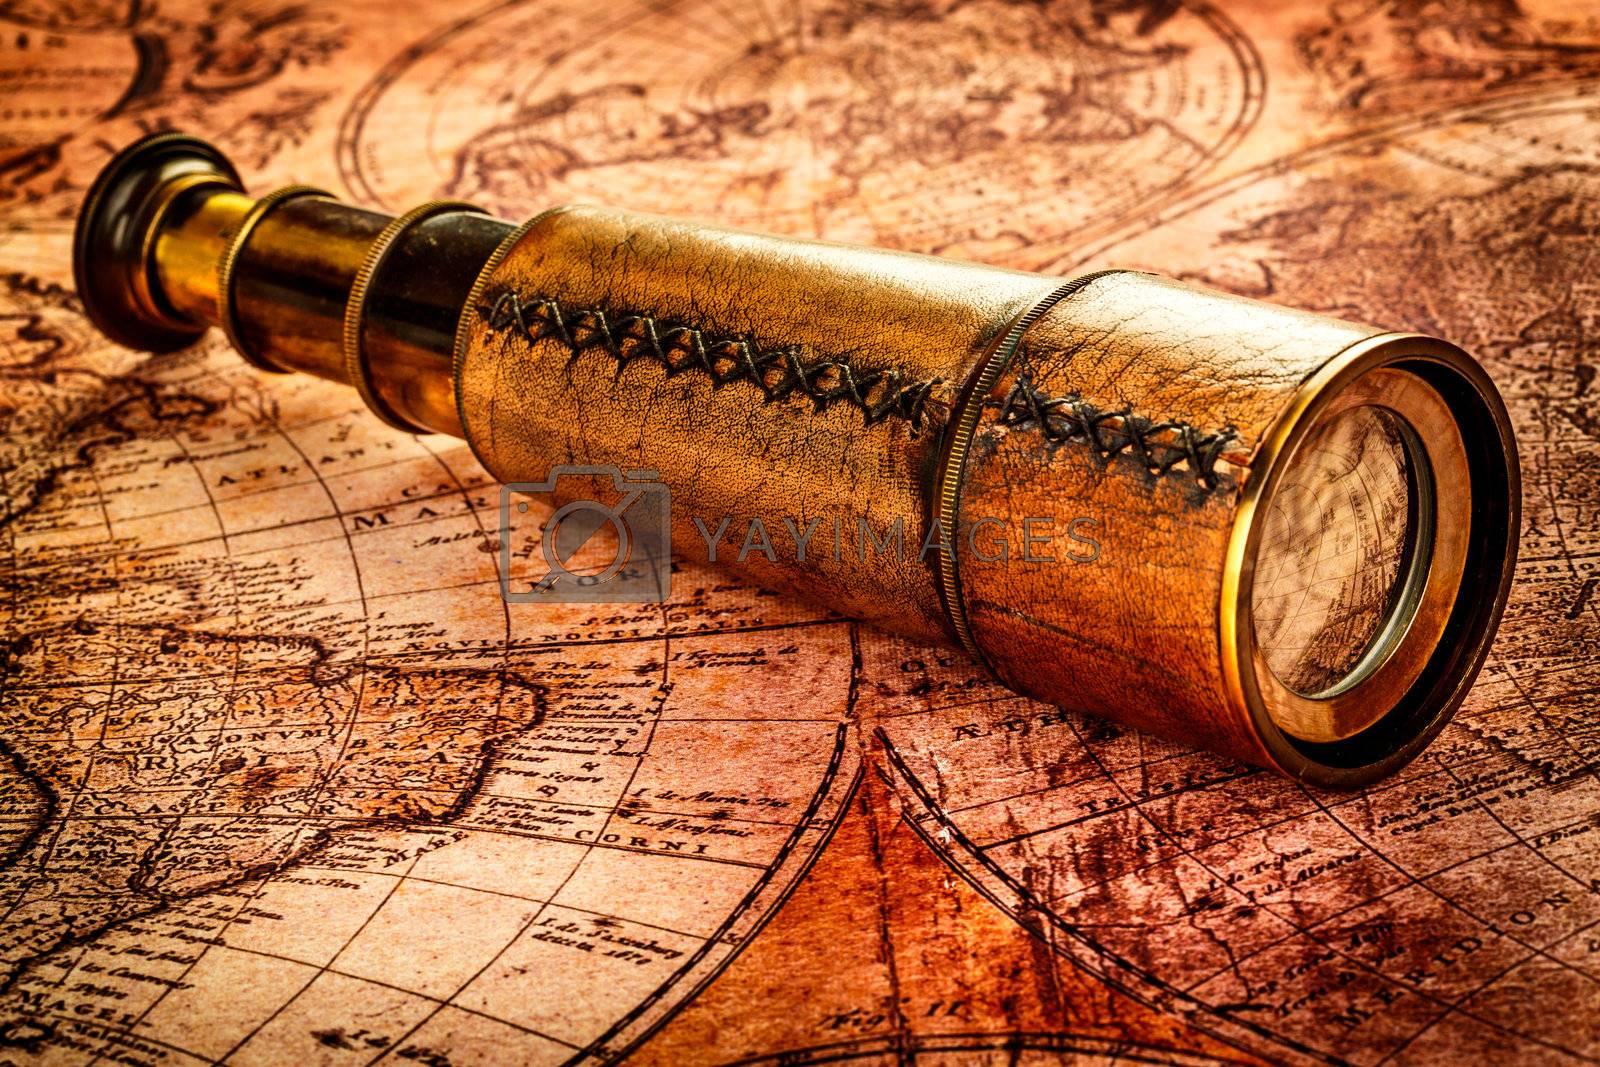 Vintage still life. Vintage spyglass lies on an ancient world map